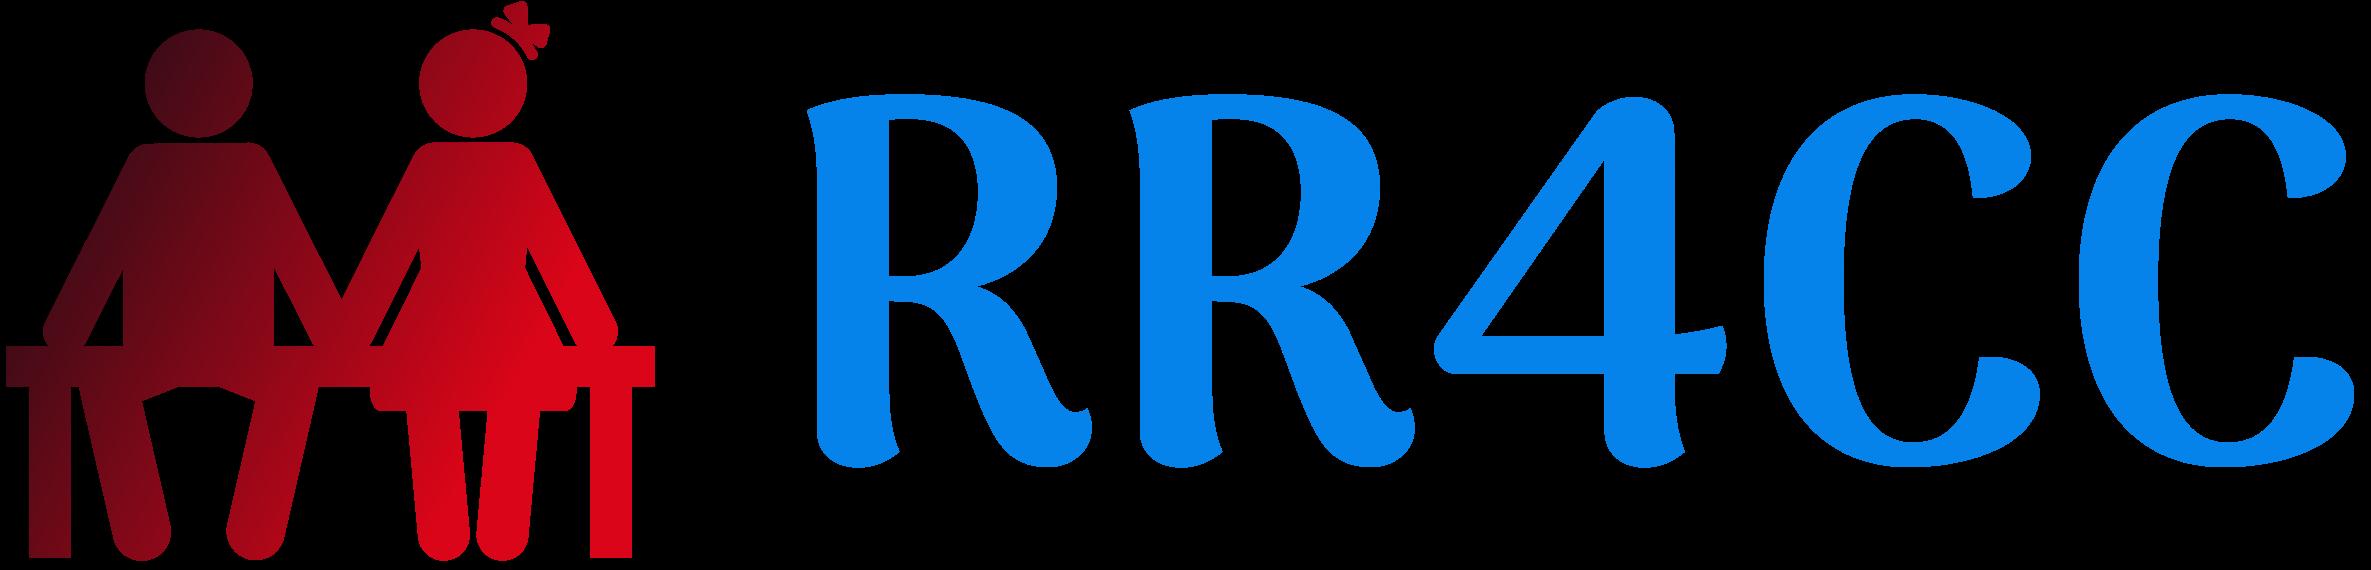 RR4CC